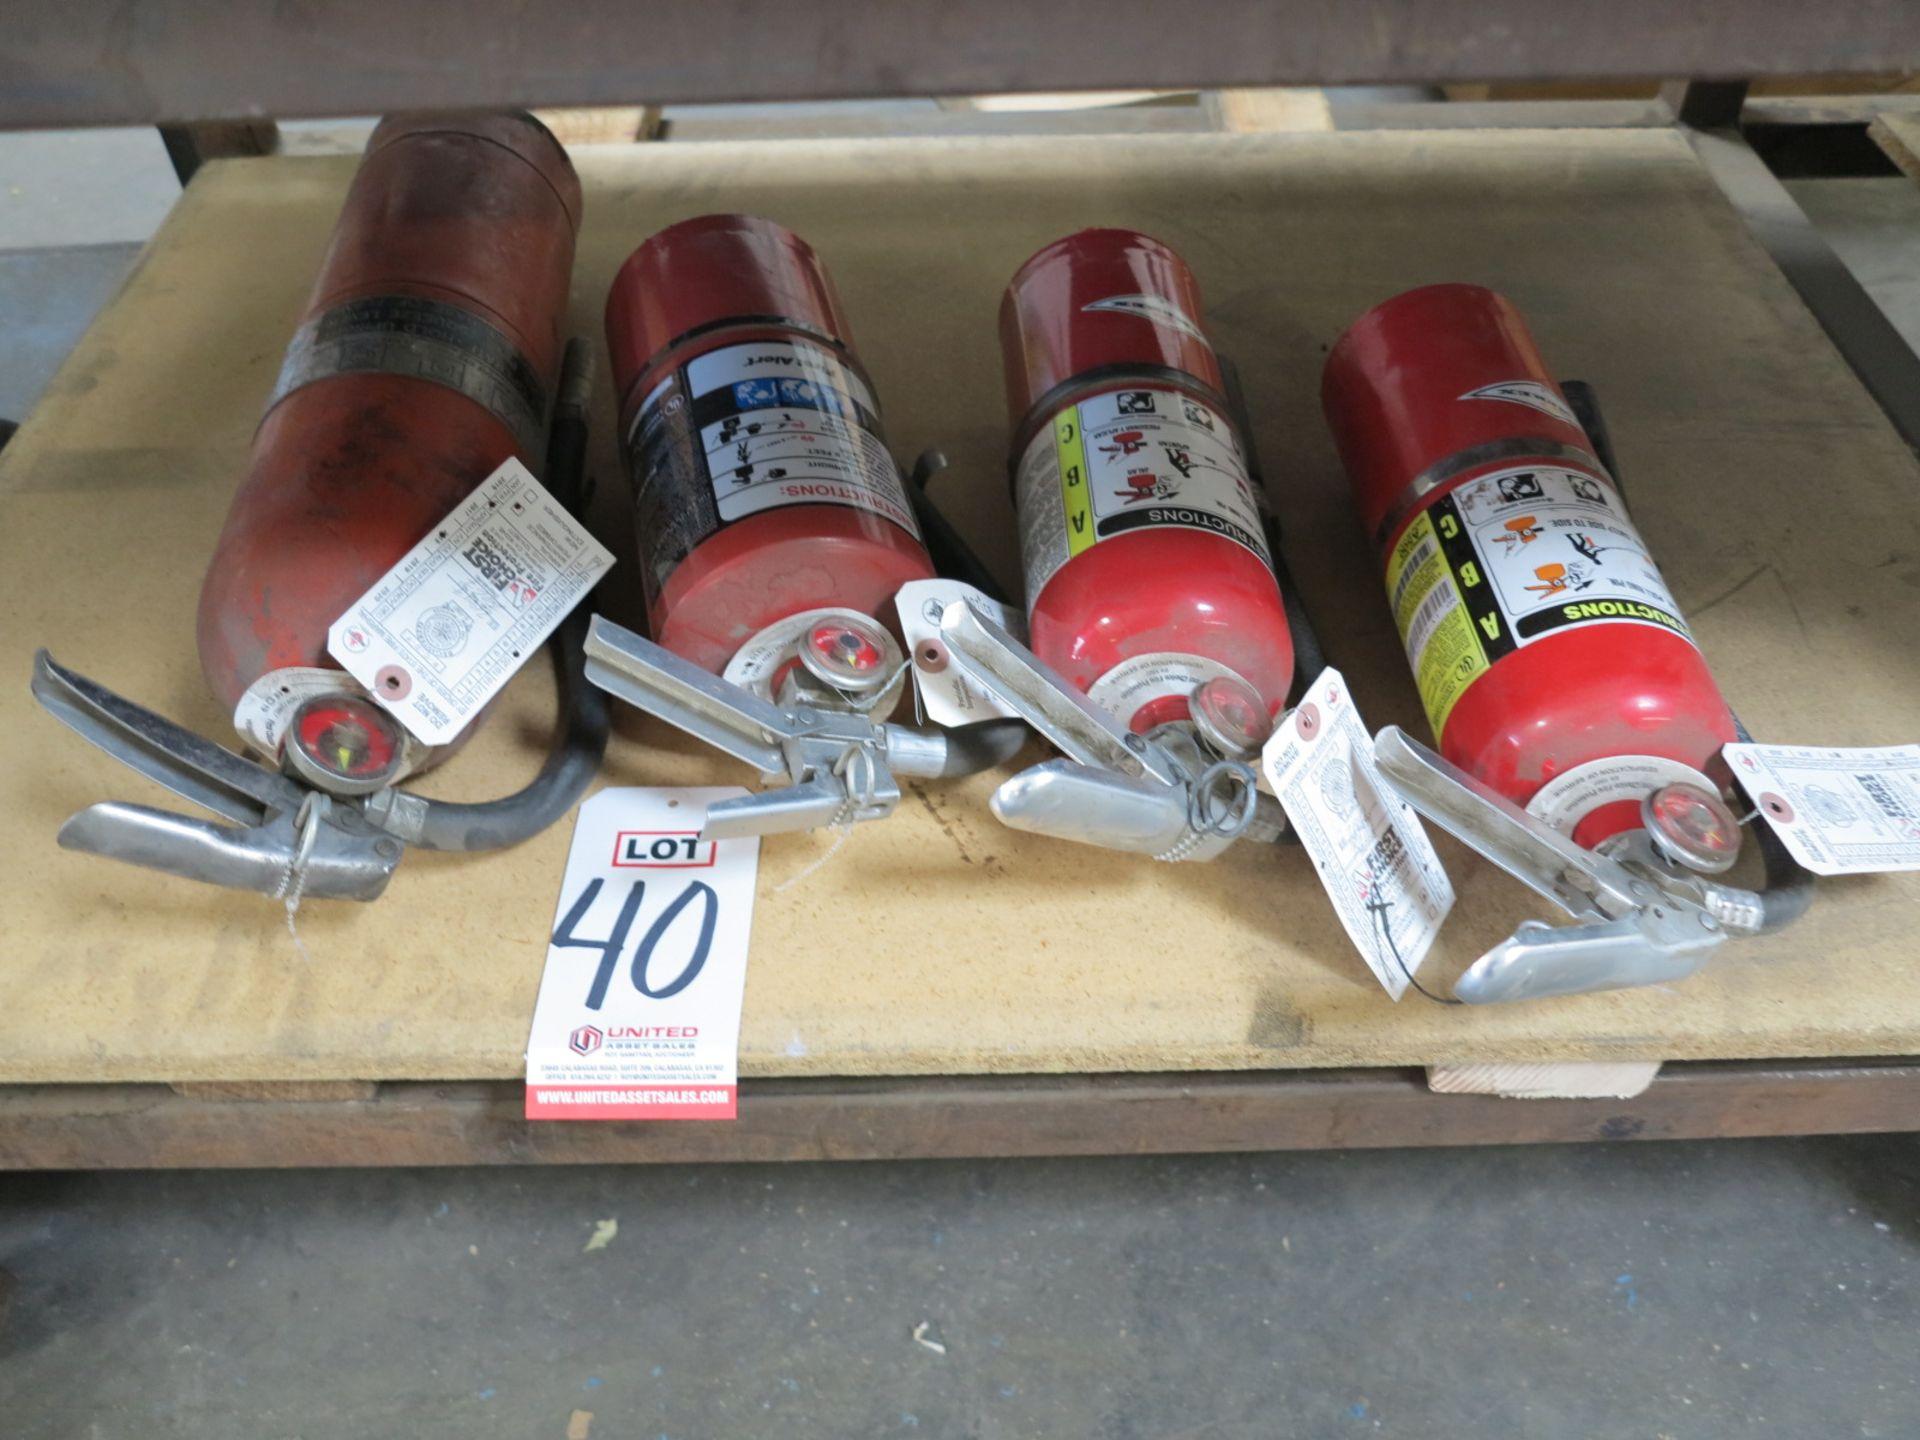 Lot 40 - LOT - (4) FIRE EXTINGUISHERS